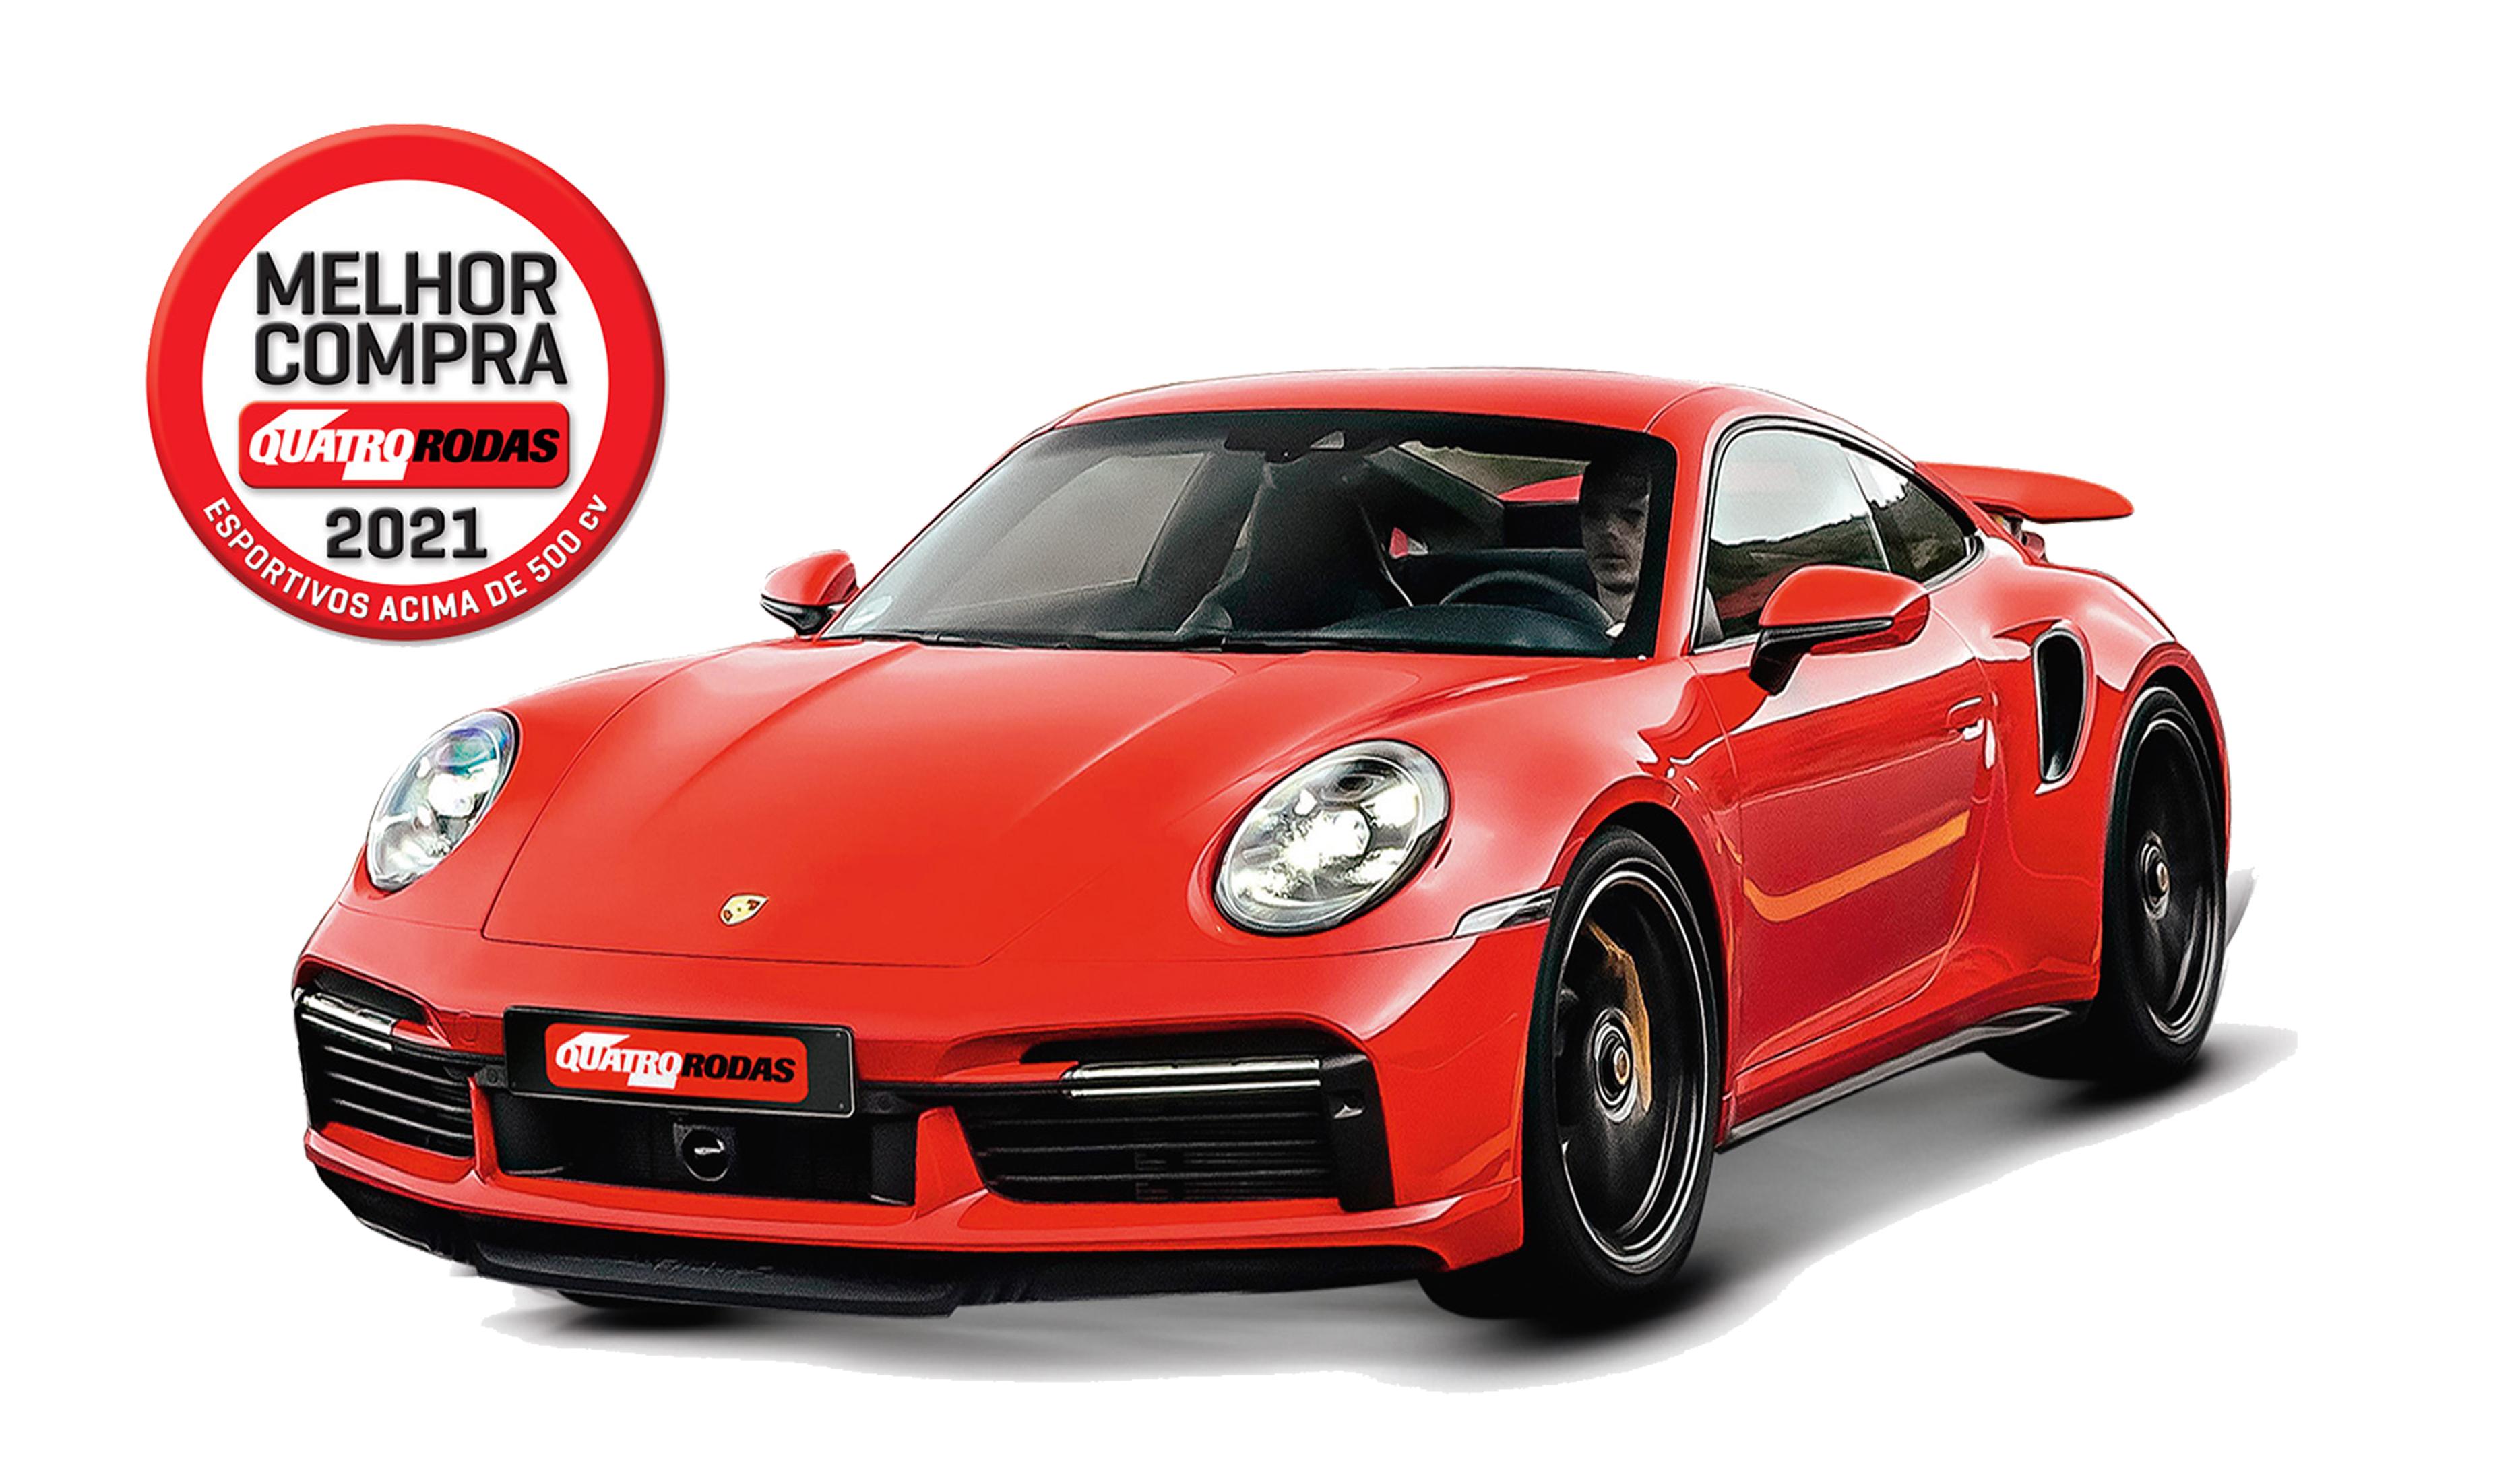 Porsche 911 Turbo S 3.7